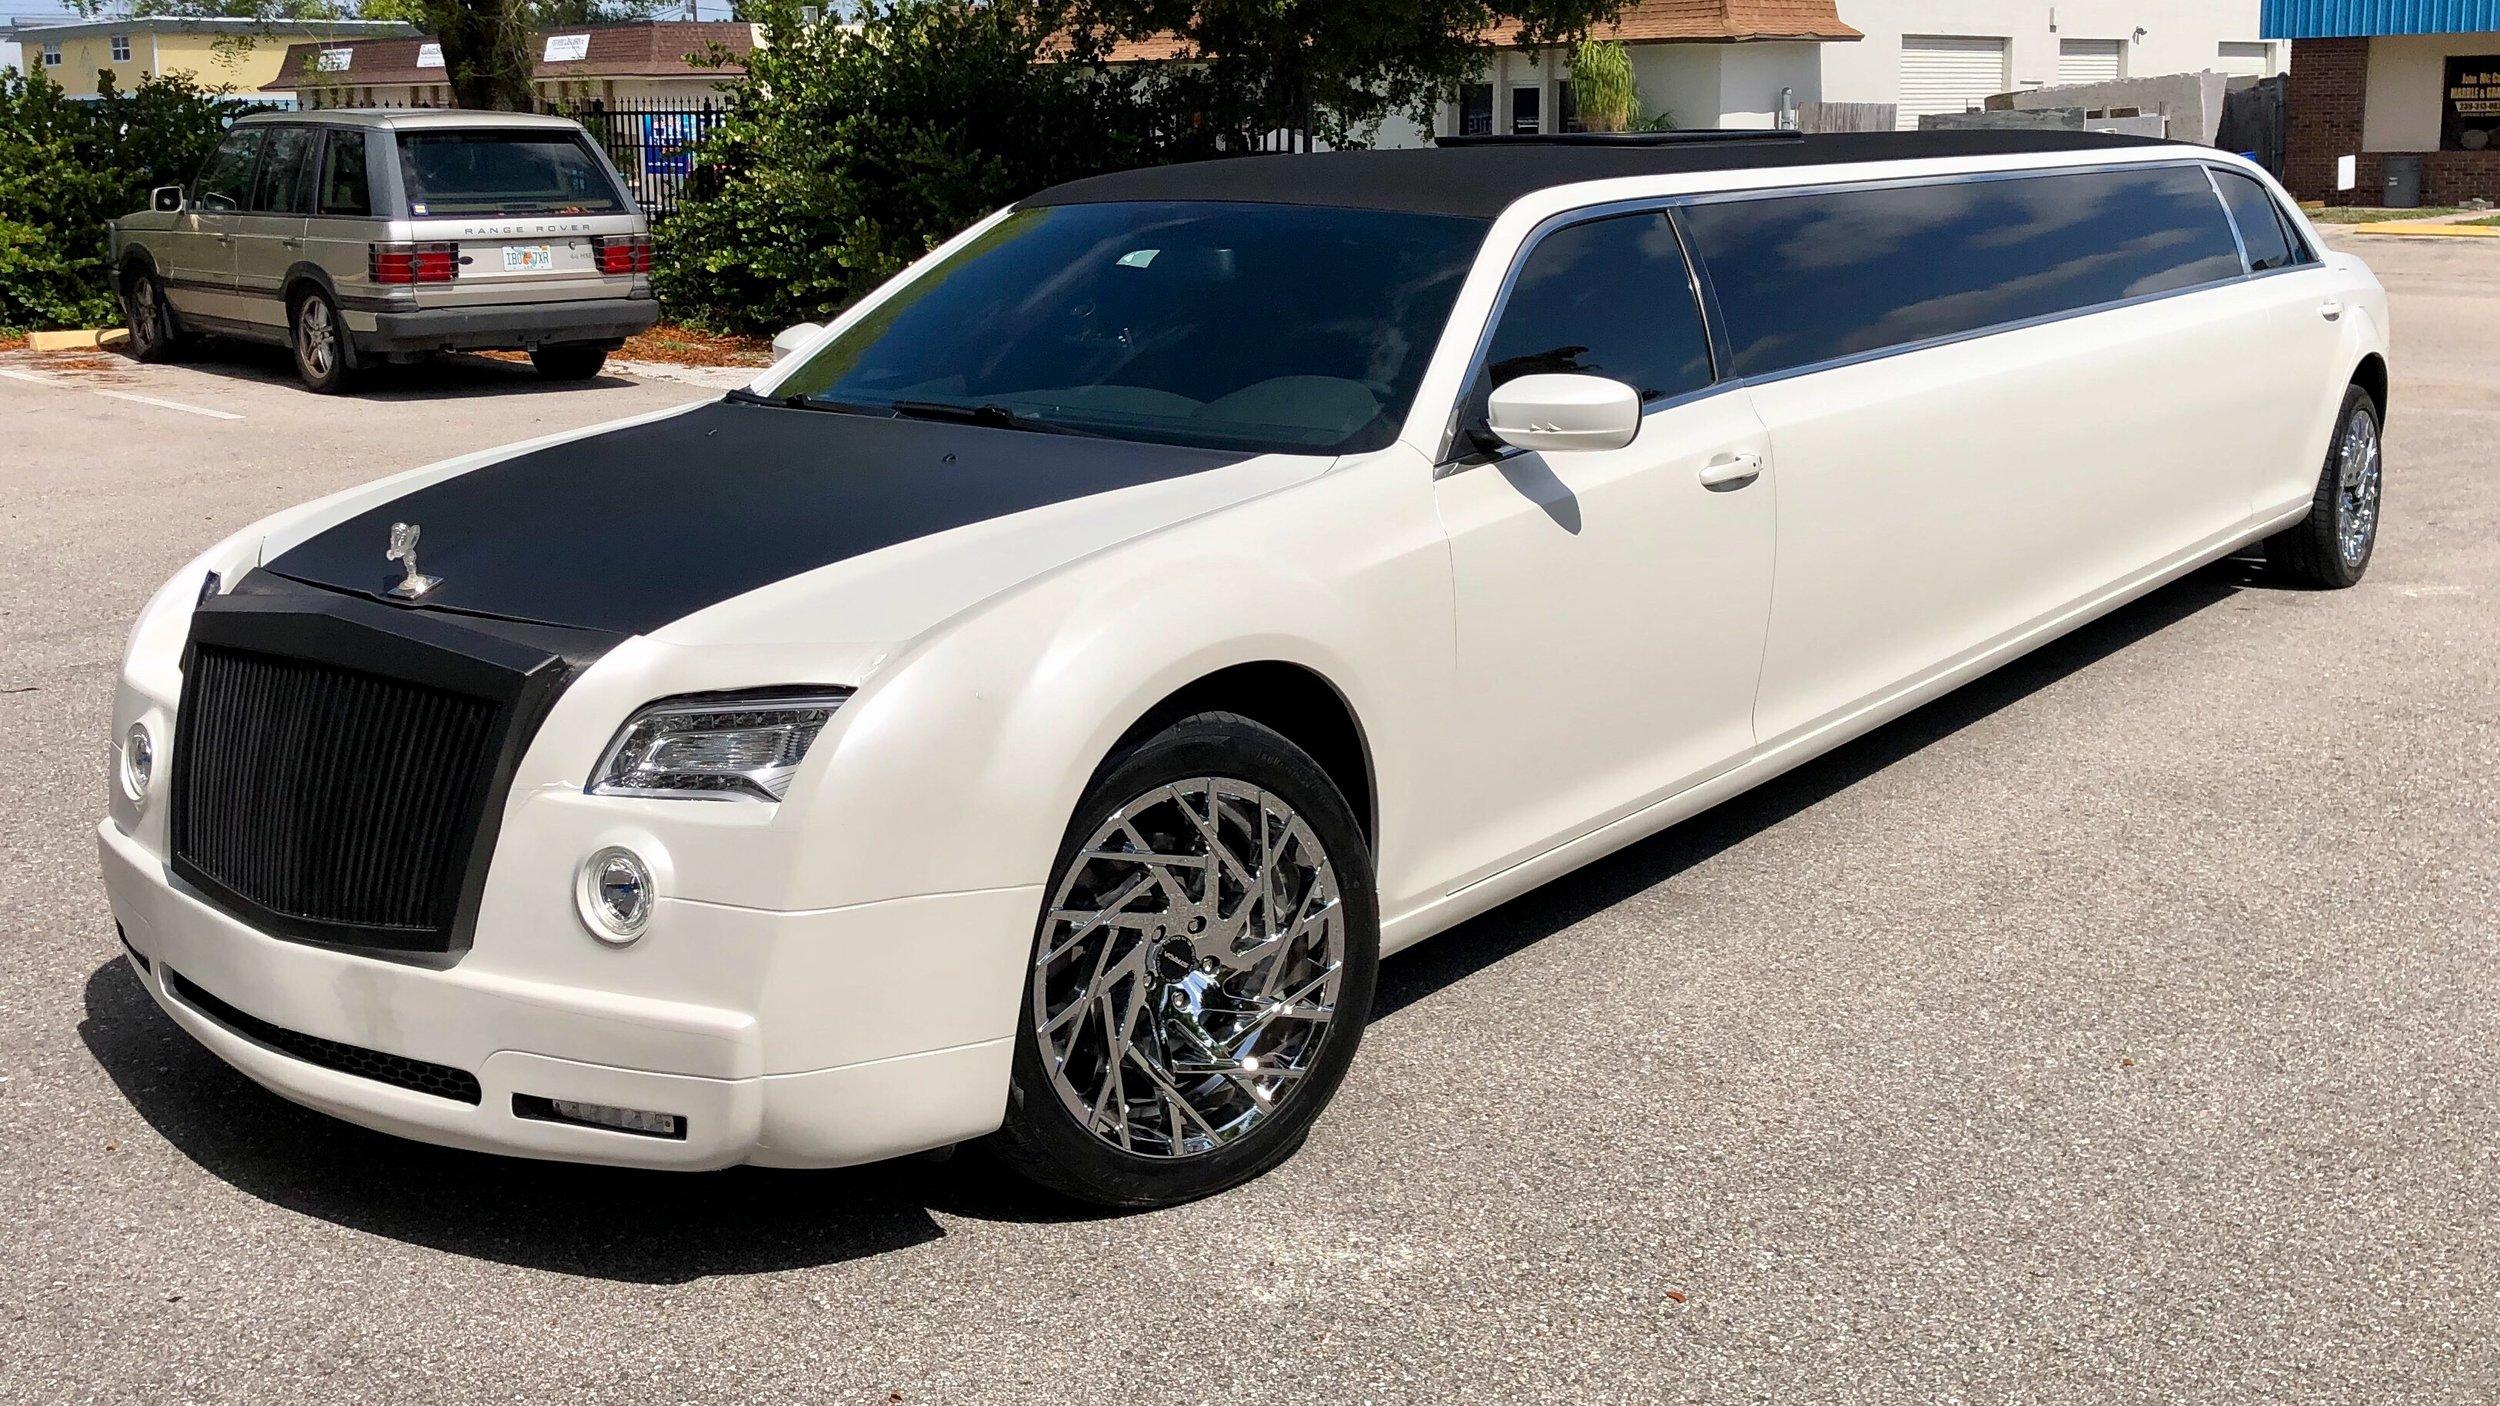 vip-limo-service-rolls-royce-phantom-300-exterior-01.jpg